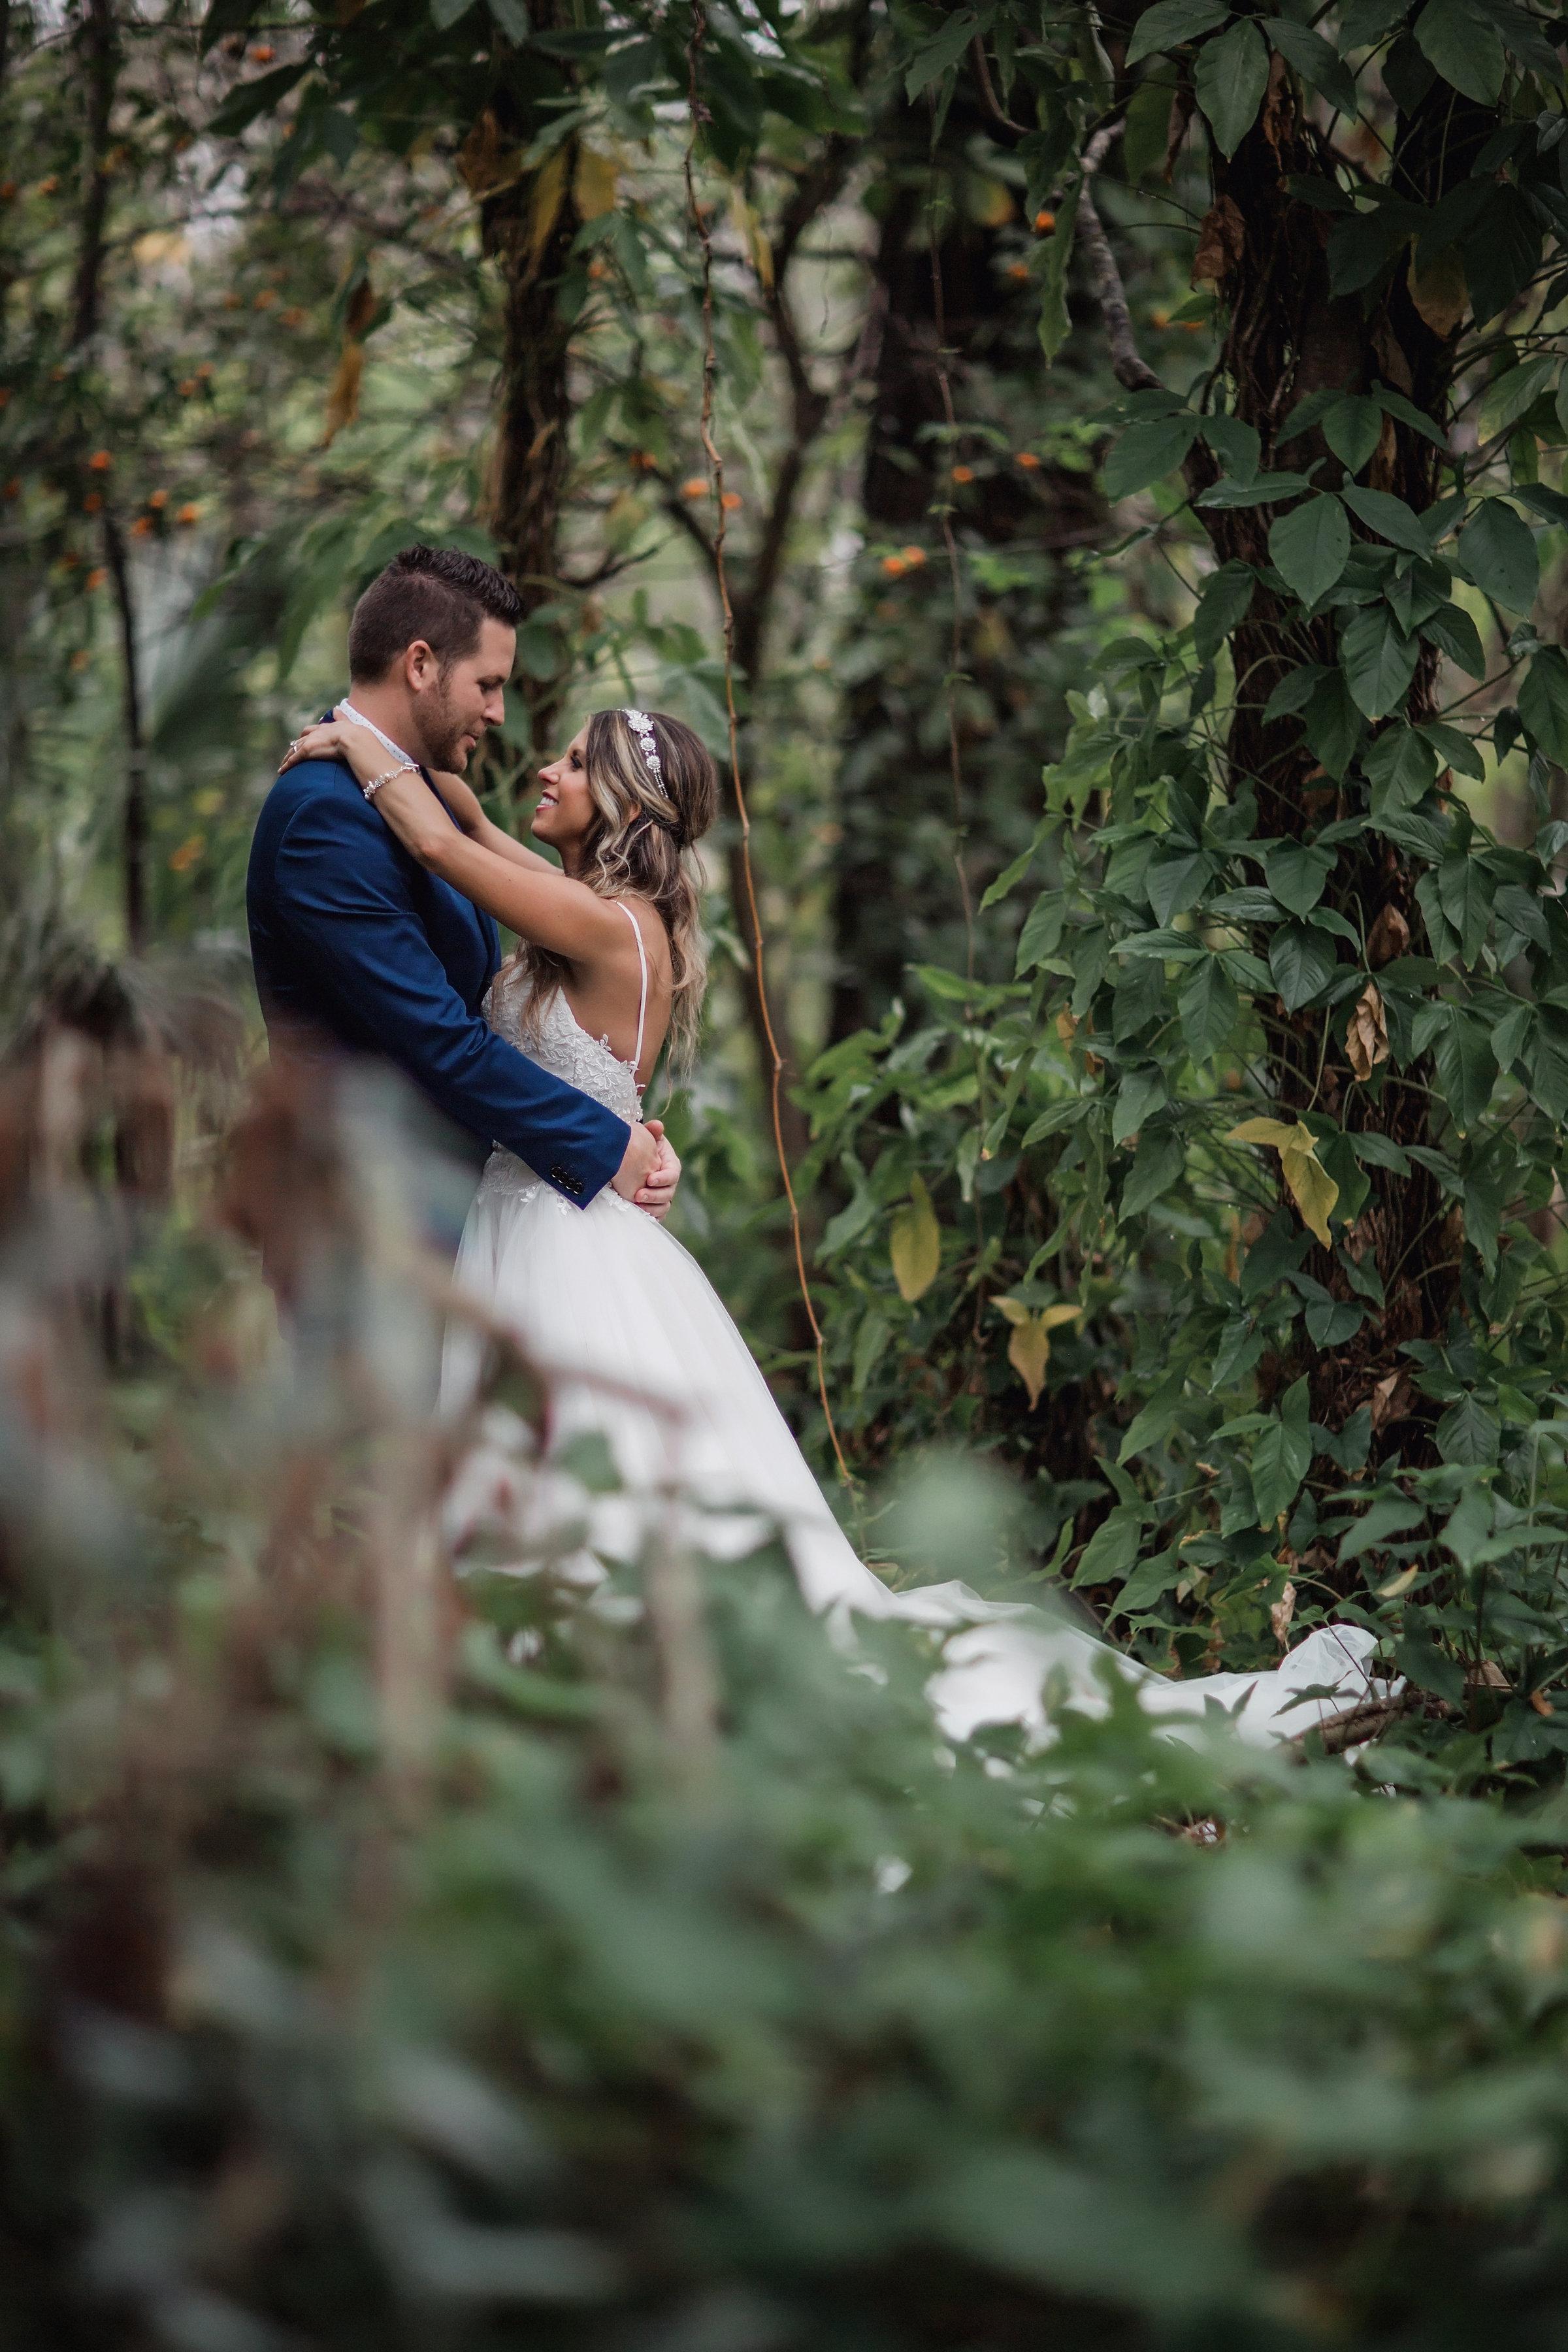 Danielle_Andrew_Wedding_Tomlinson-9510.jpg